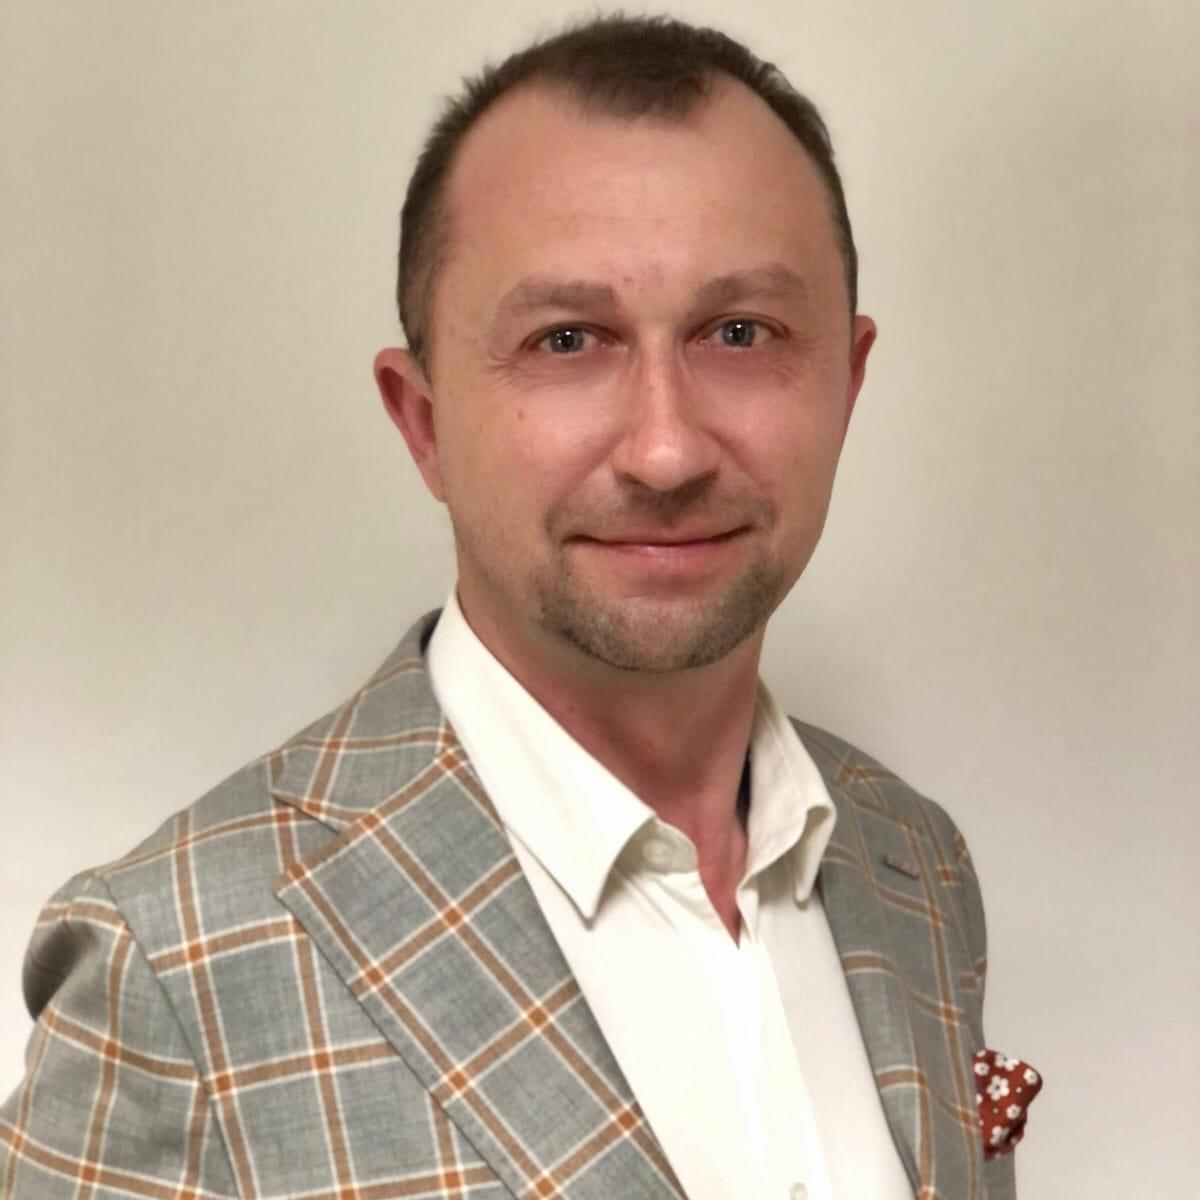 Michał Panicz